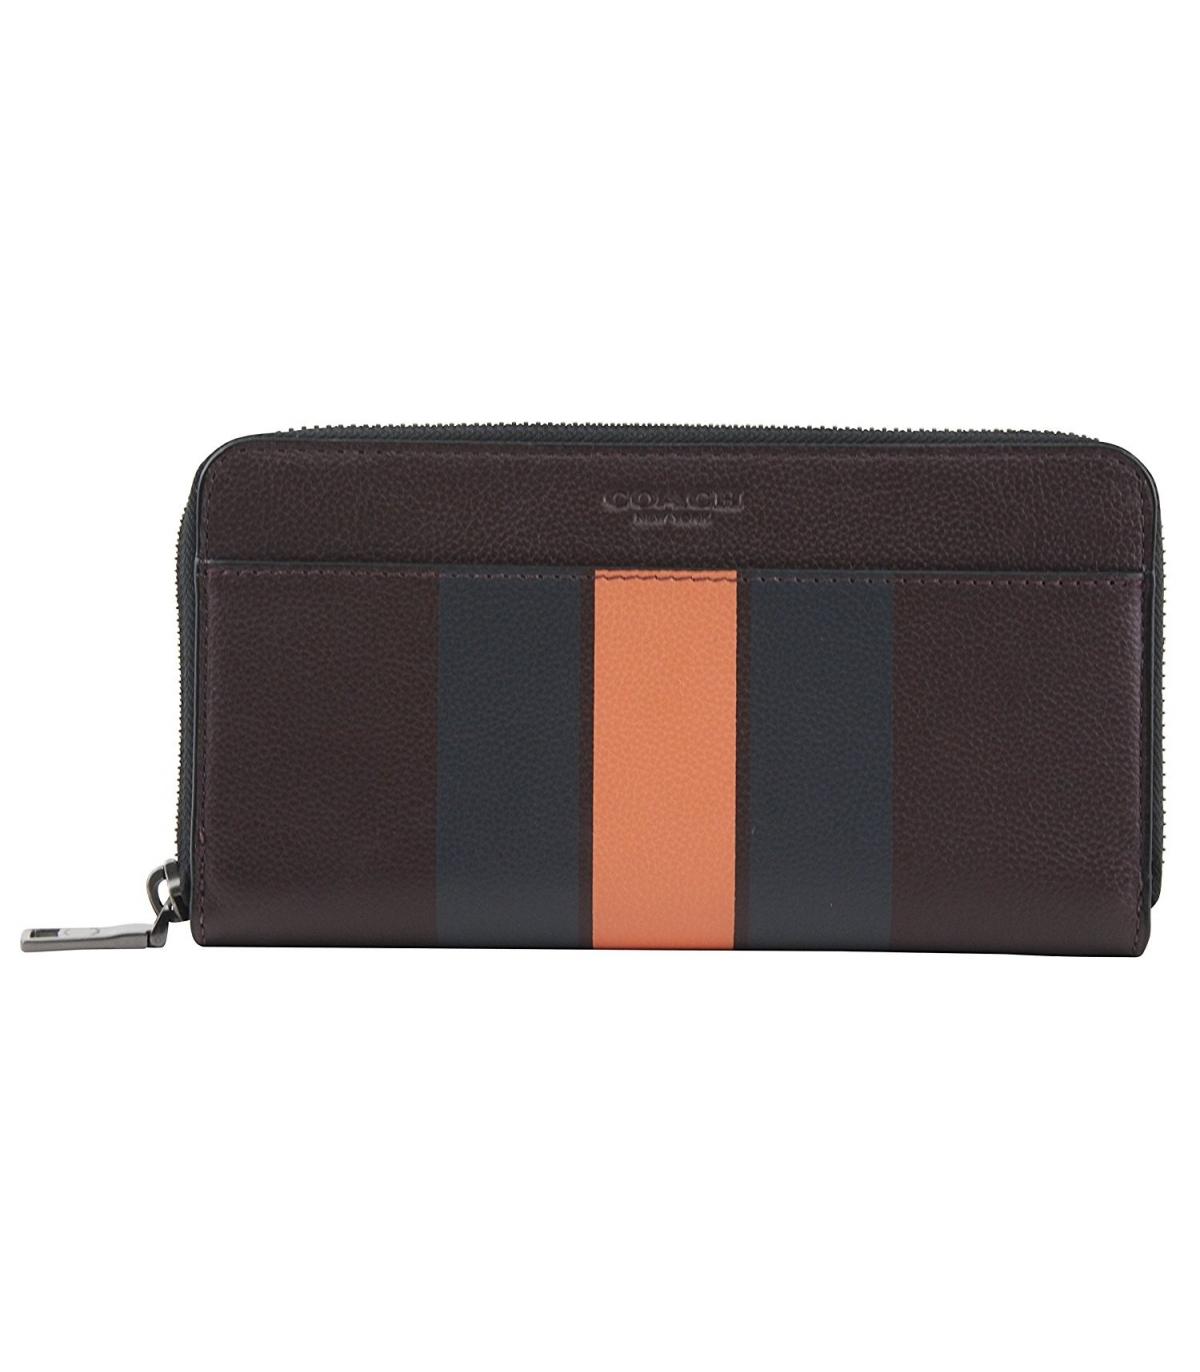 46fef41b27c ... low cost coach signature accordion zip around wallet 194e8 35763